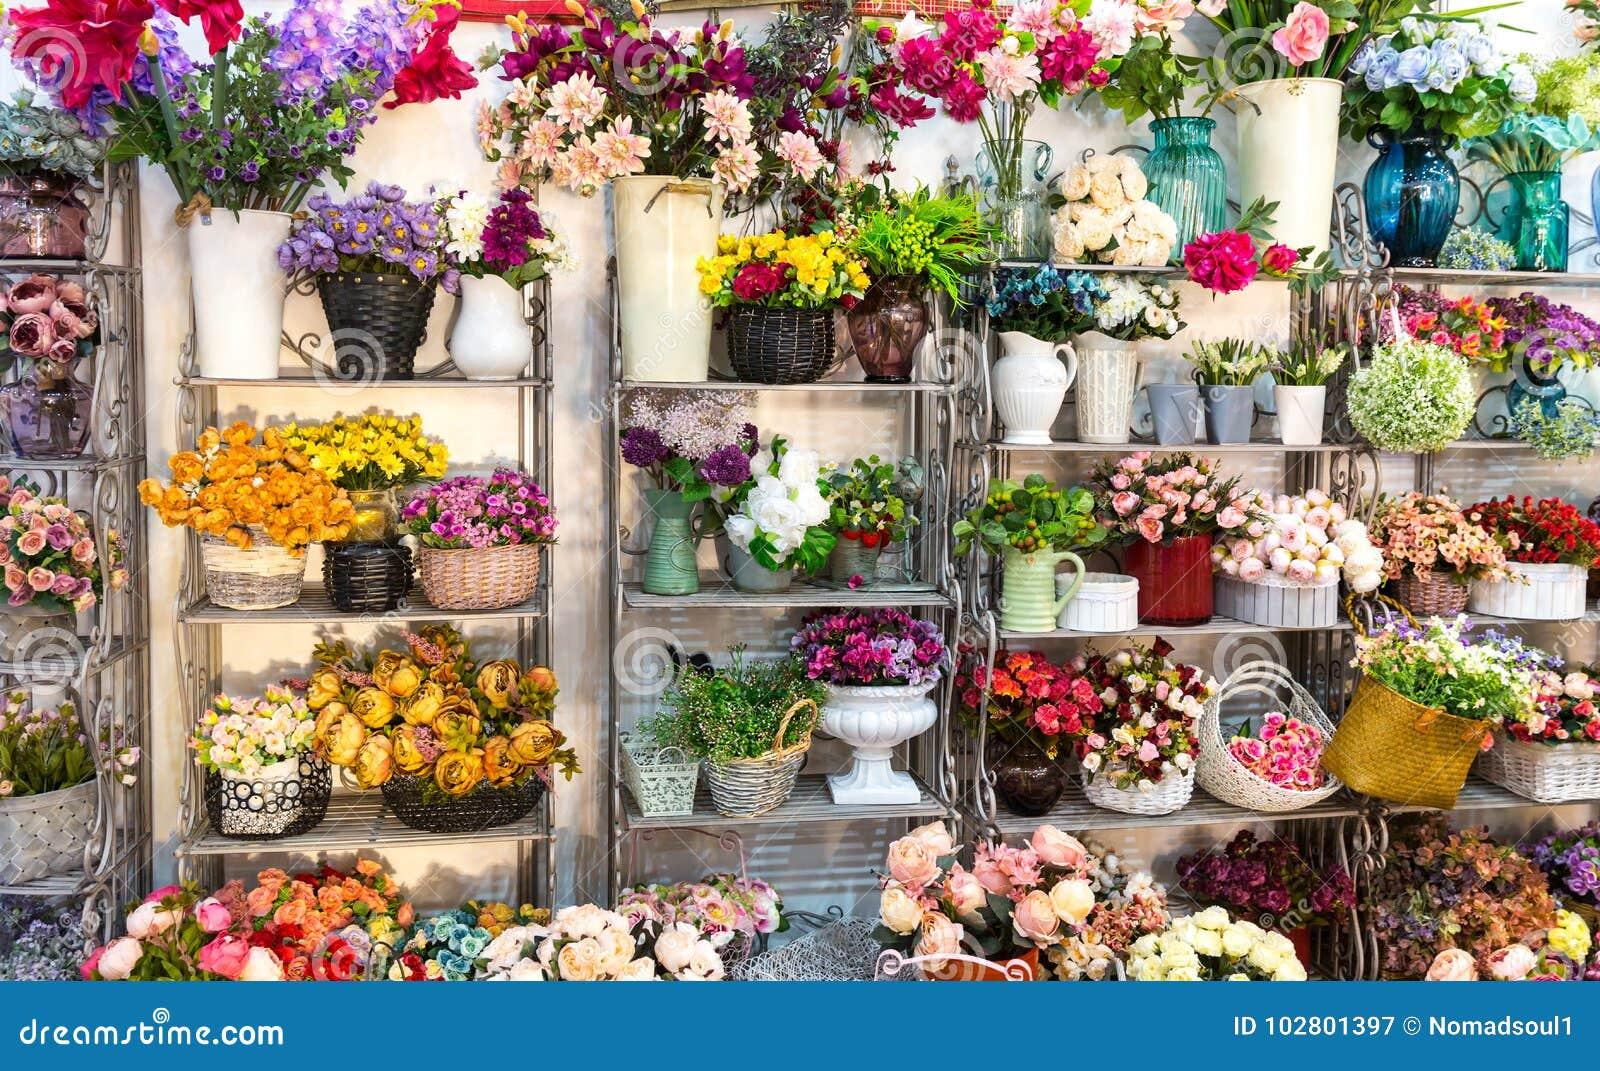 Flower shop bouquets on shelf florist business stock image image of business florist 102801397 - Beautiful photoshelves ...